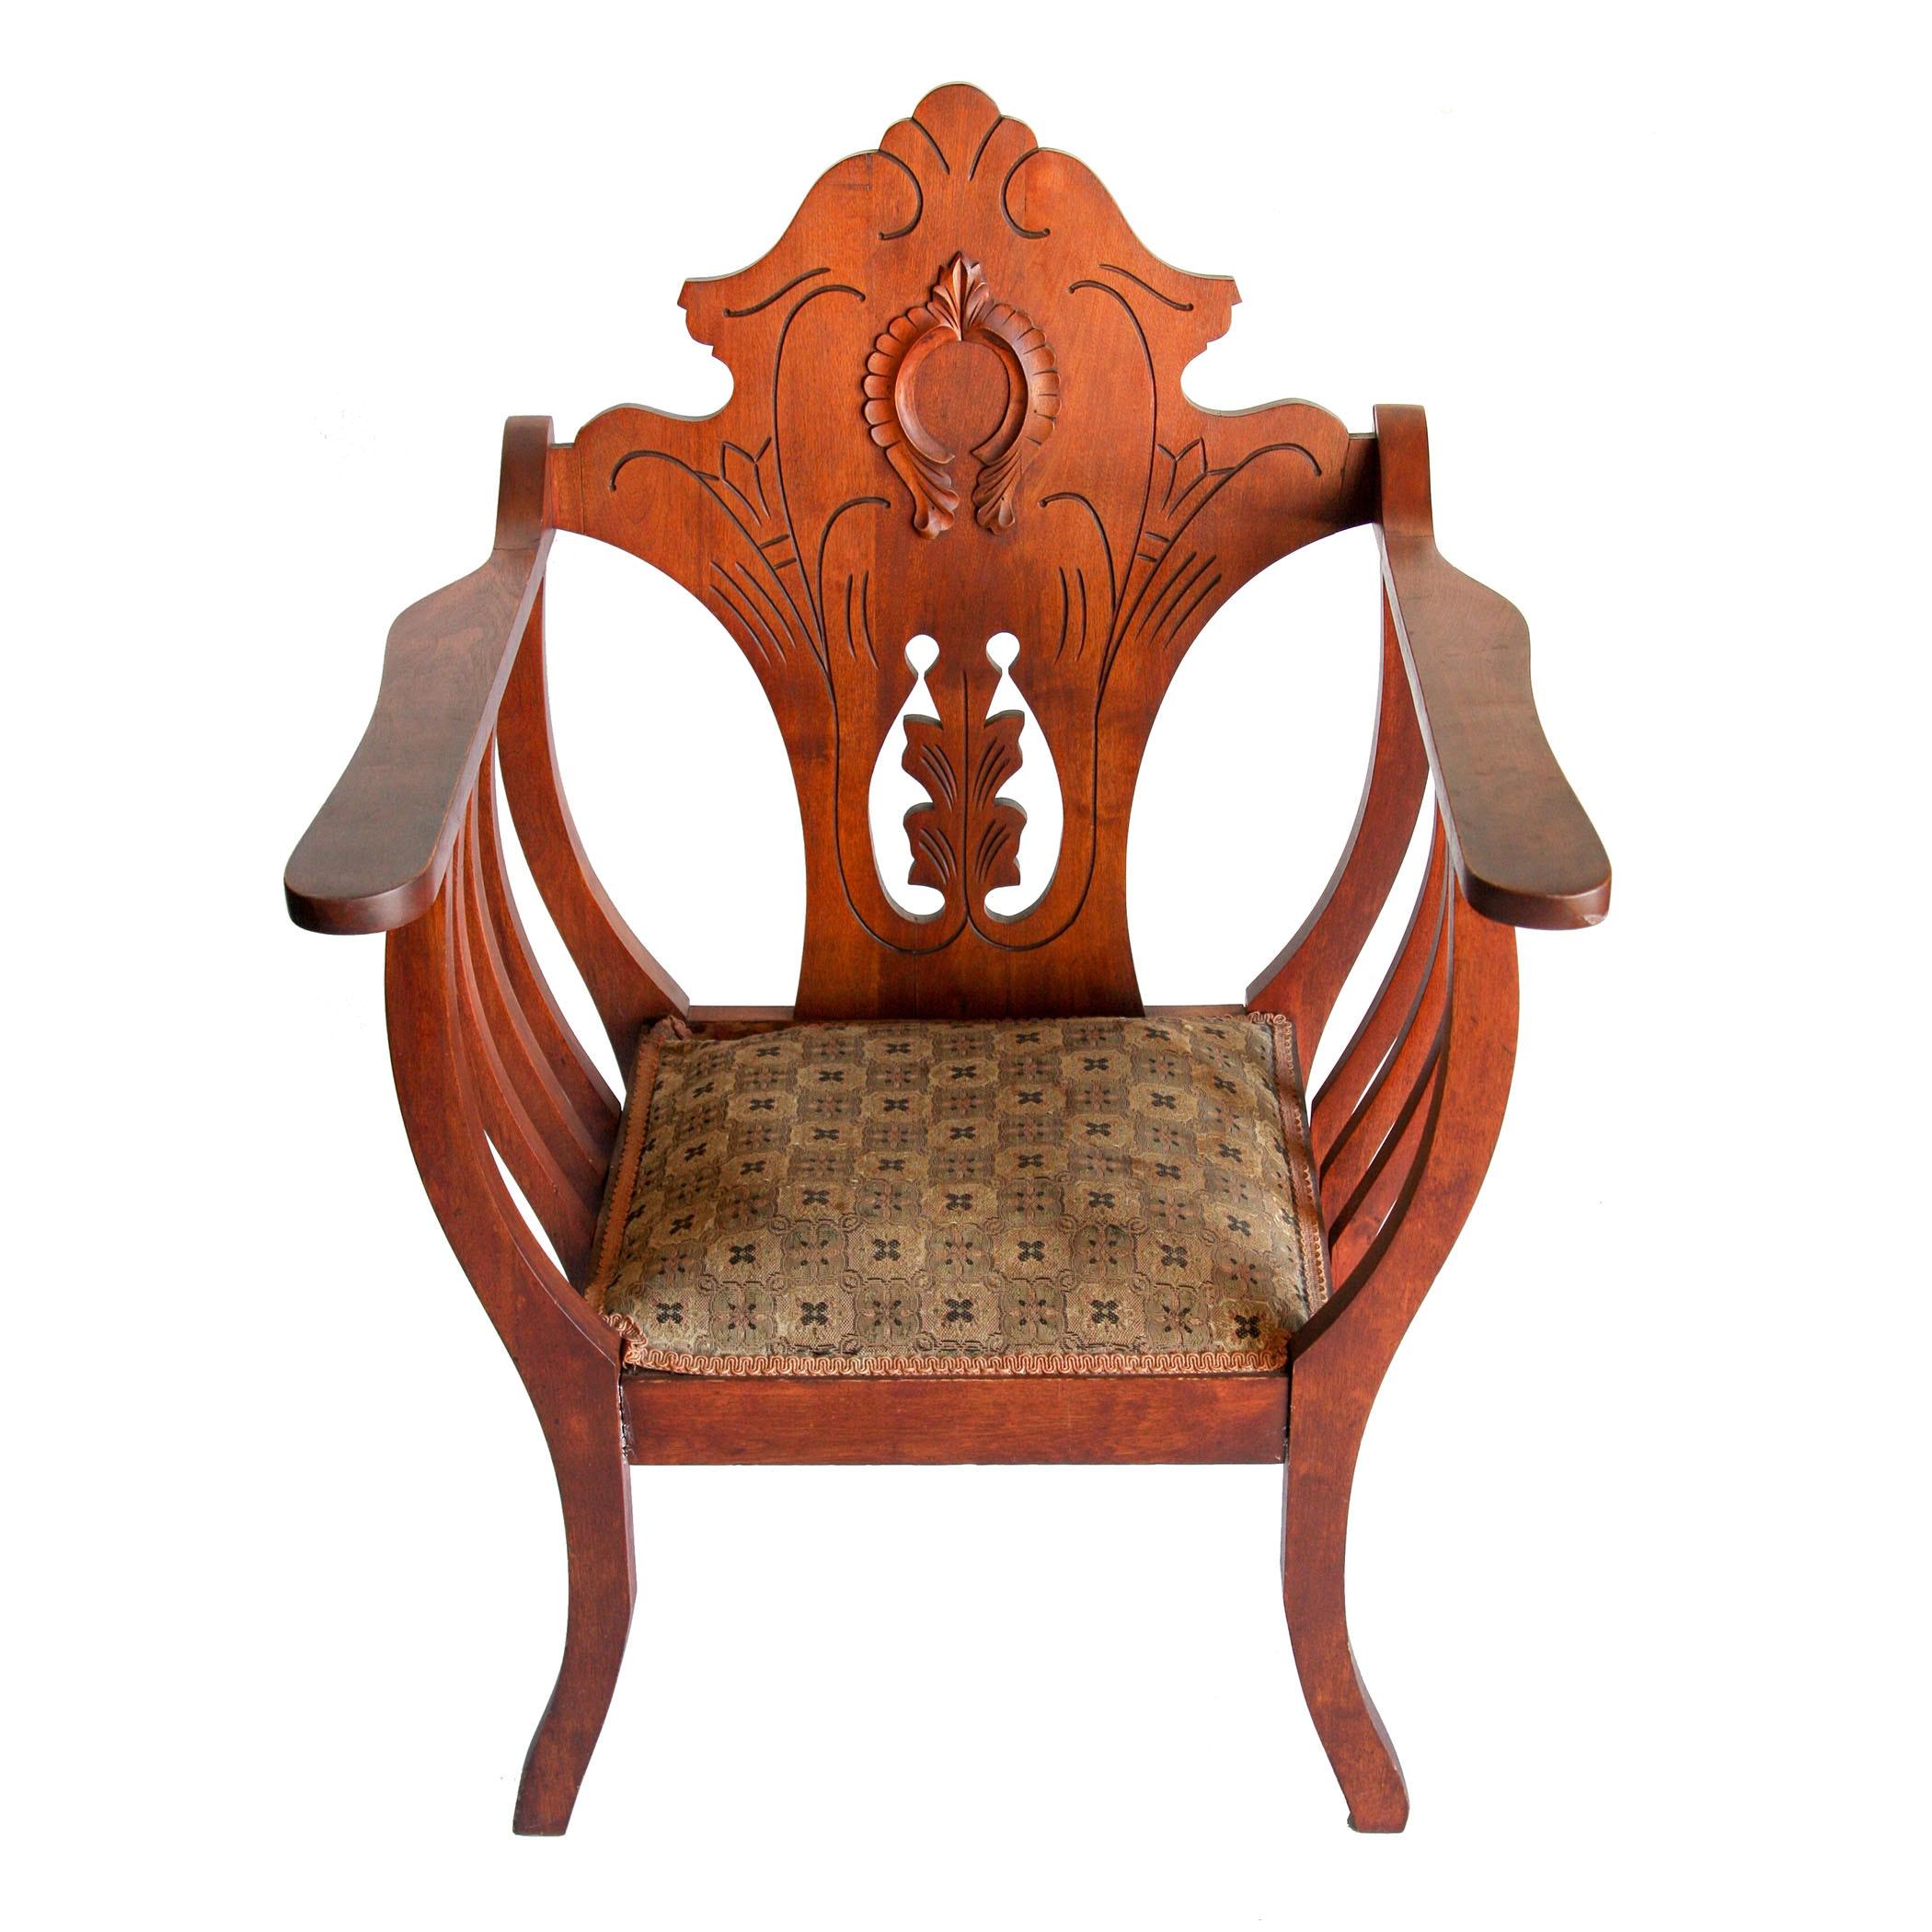 Antique Walnut Armchair Which Resembles a Savonarola Chair